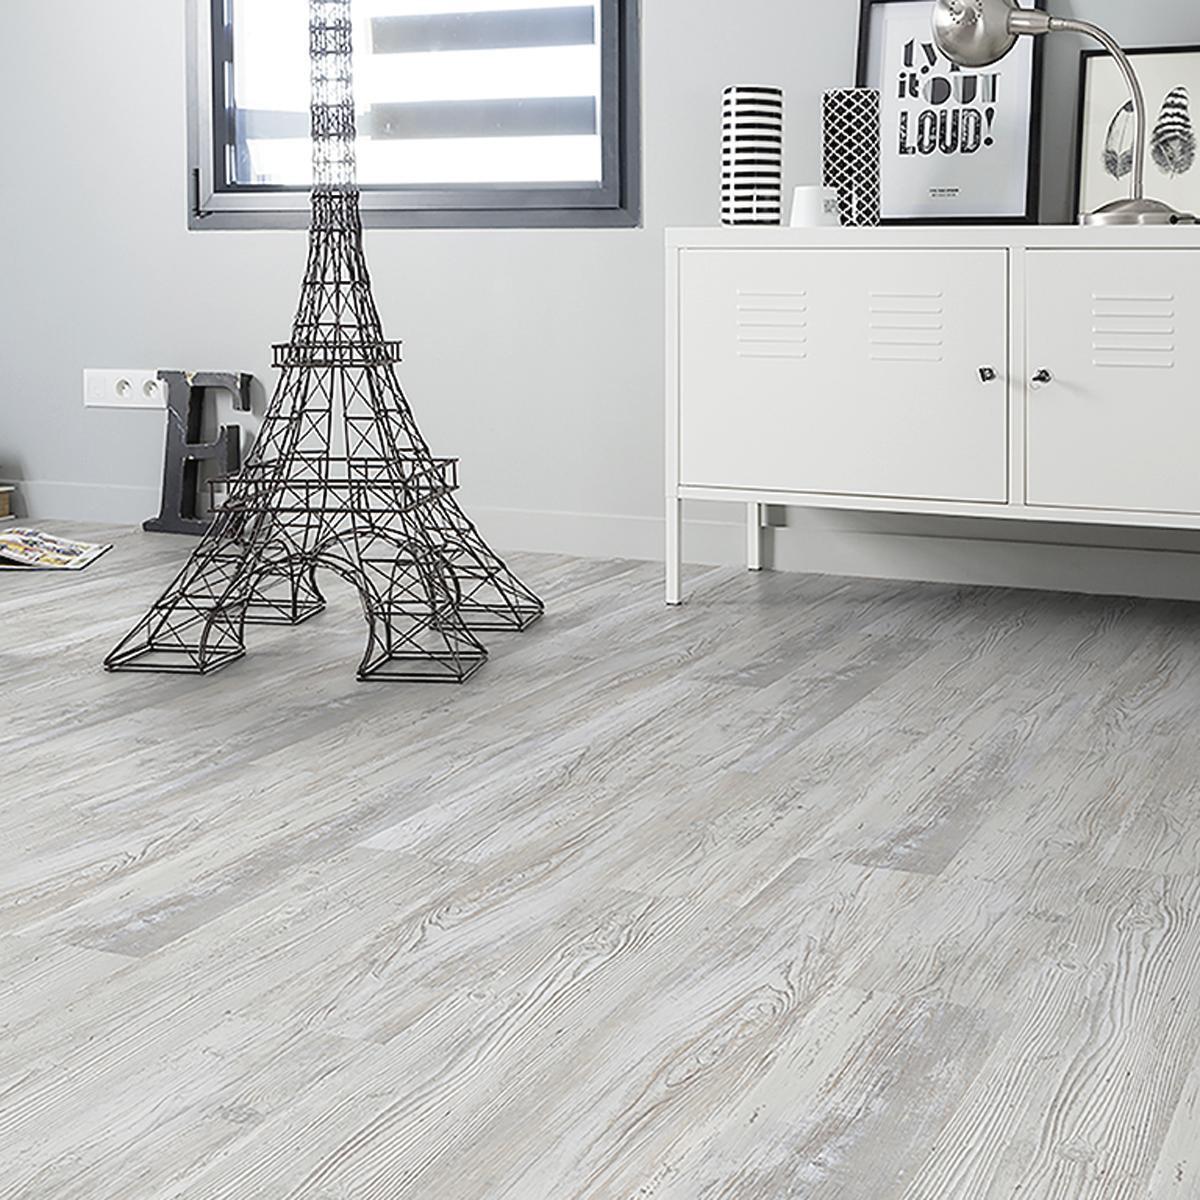 Pavimento PVC adesivo Senso Rustic Hielo Sp 2 mm bianco - 1